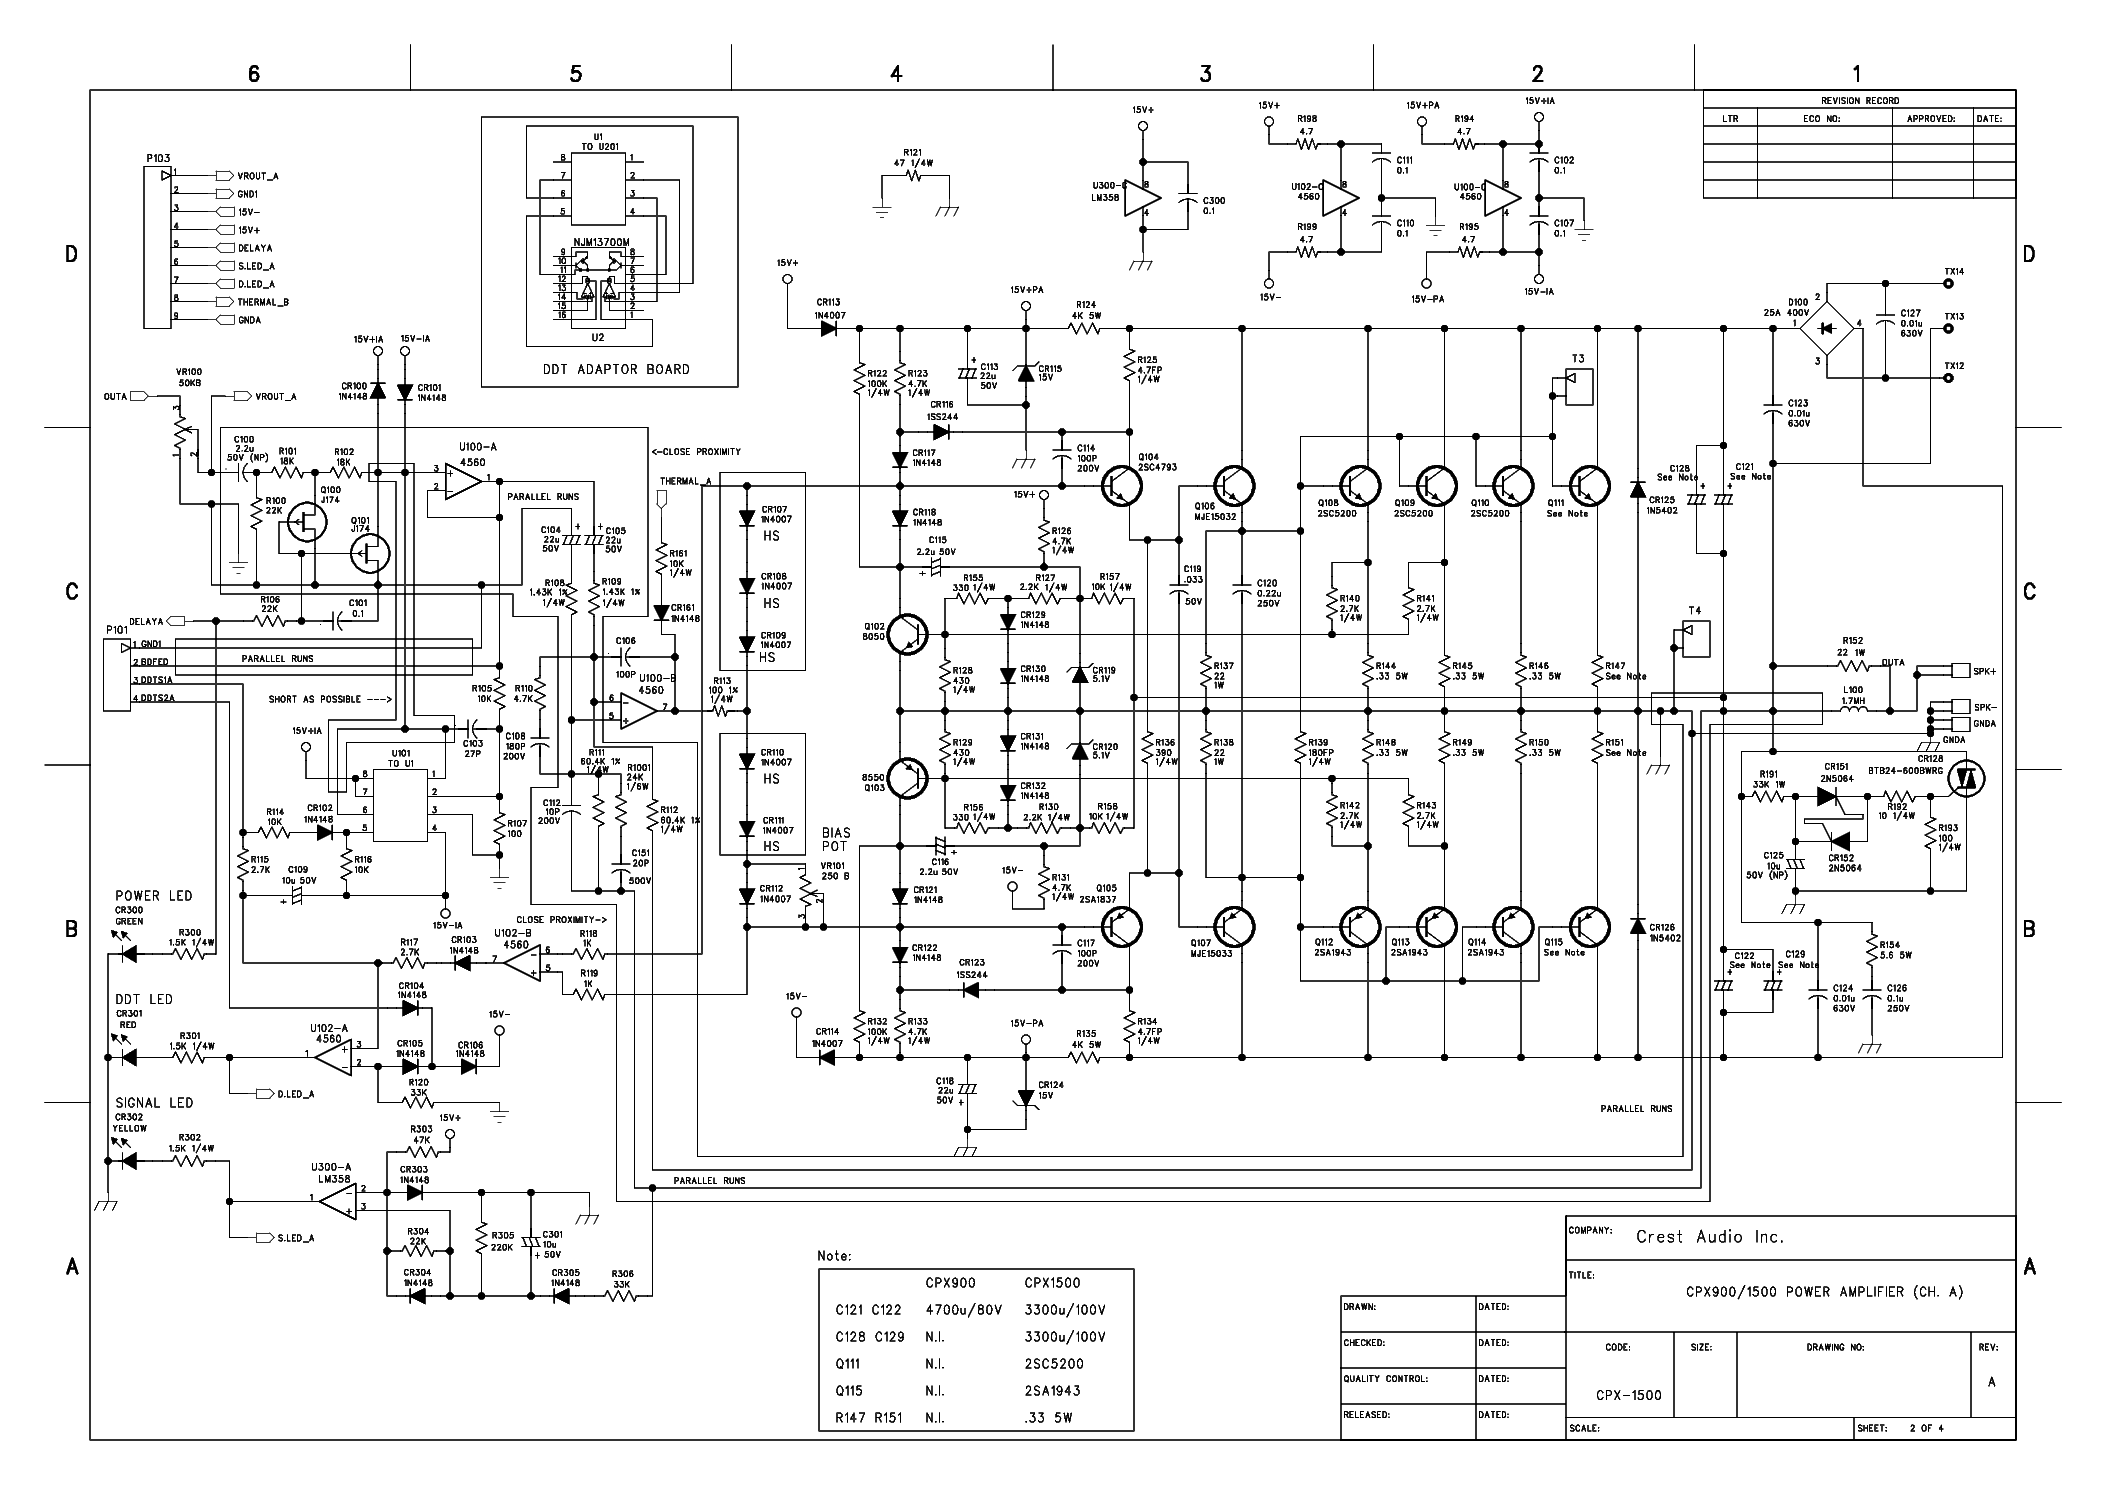 crest audio pro9200 sch service manual download schematics eeprom rh elektrotanya com IC Schematic Diagram IC Schematic Diagram